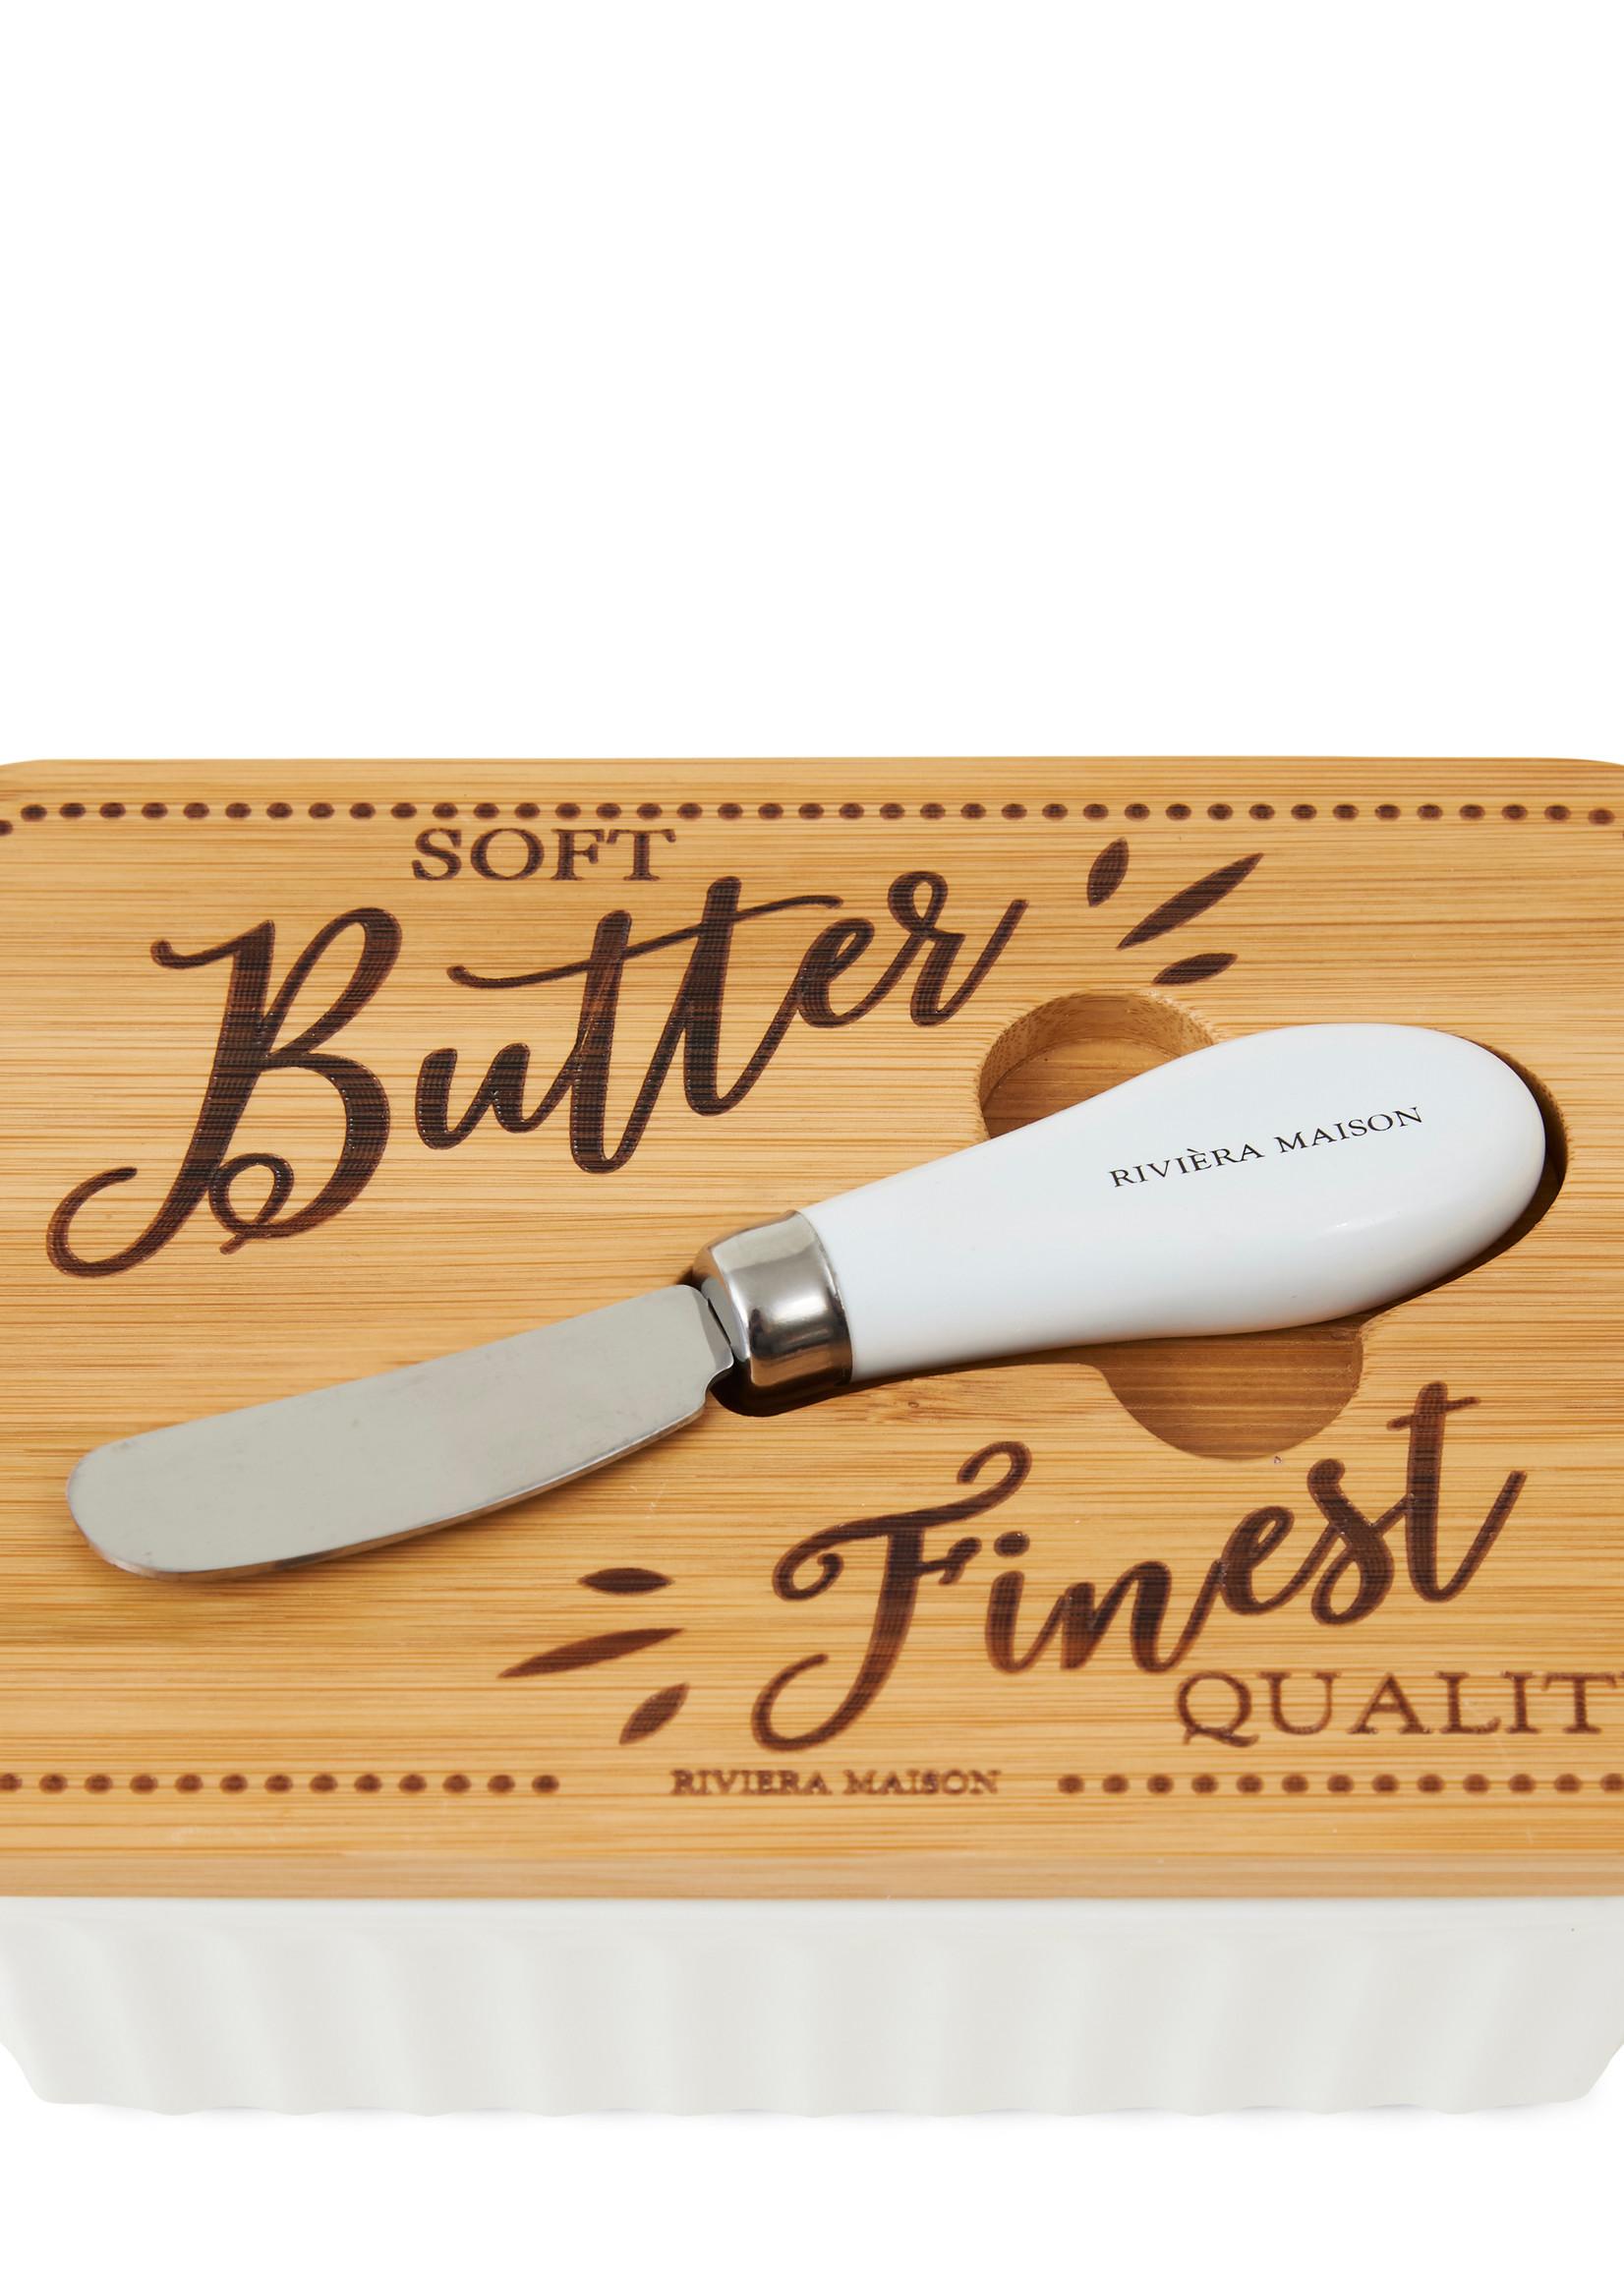 Riviera Maison Finest quality butter dish